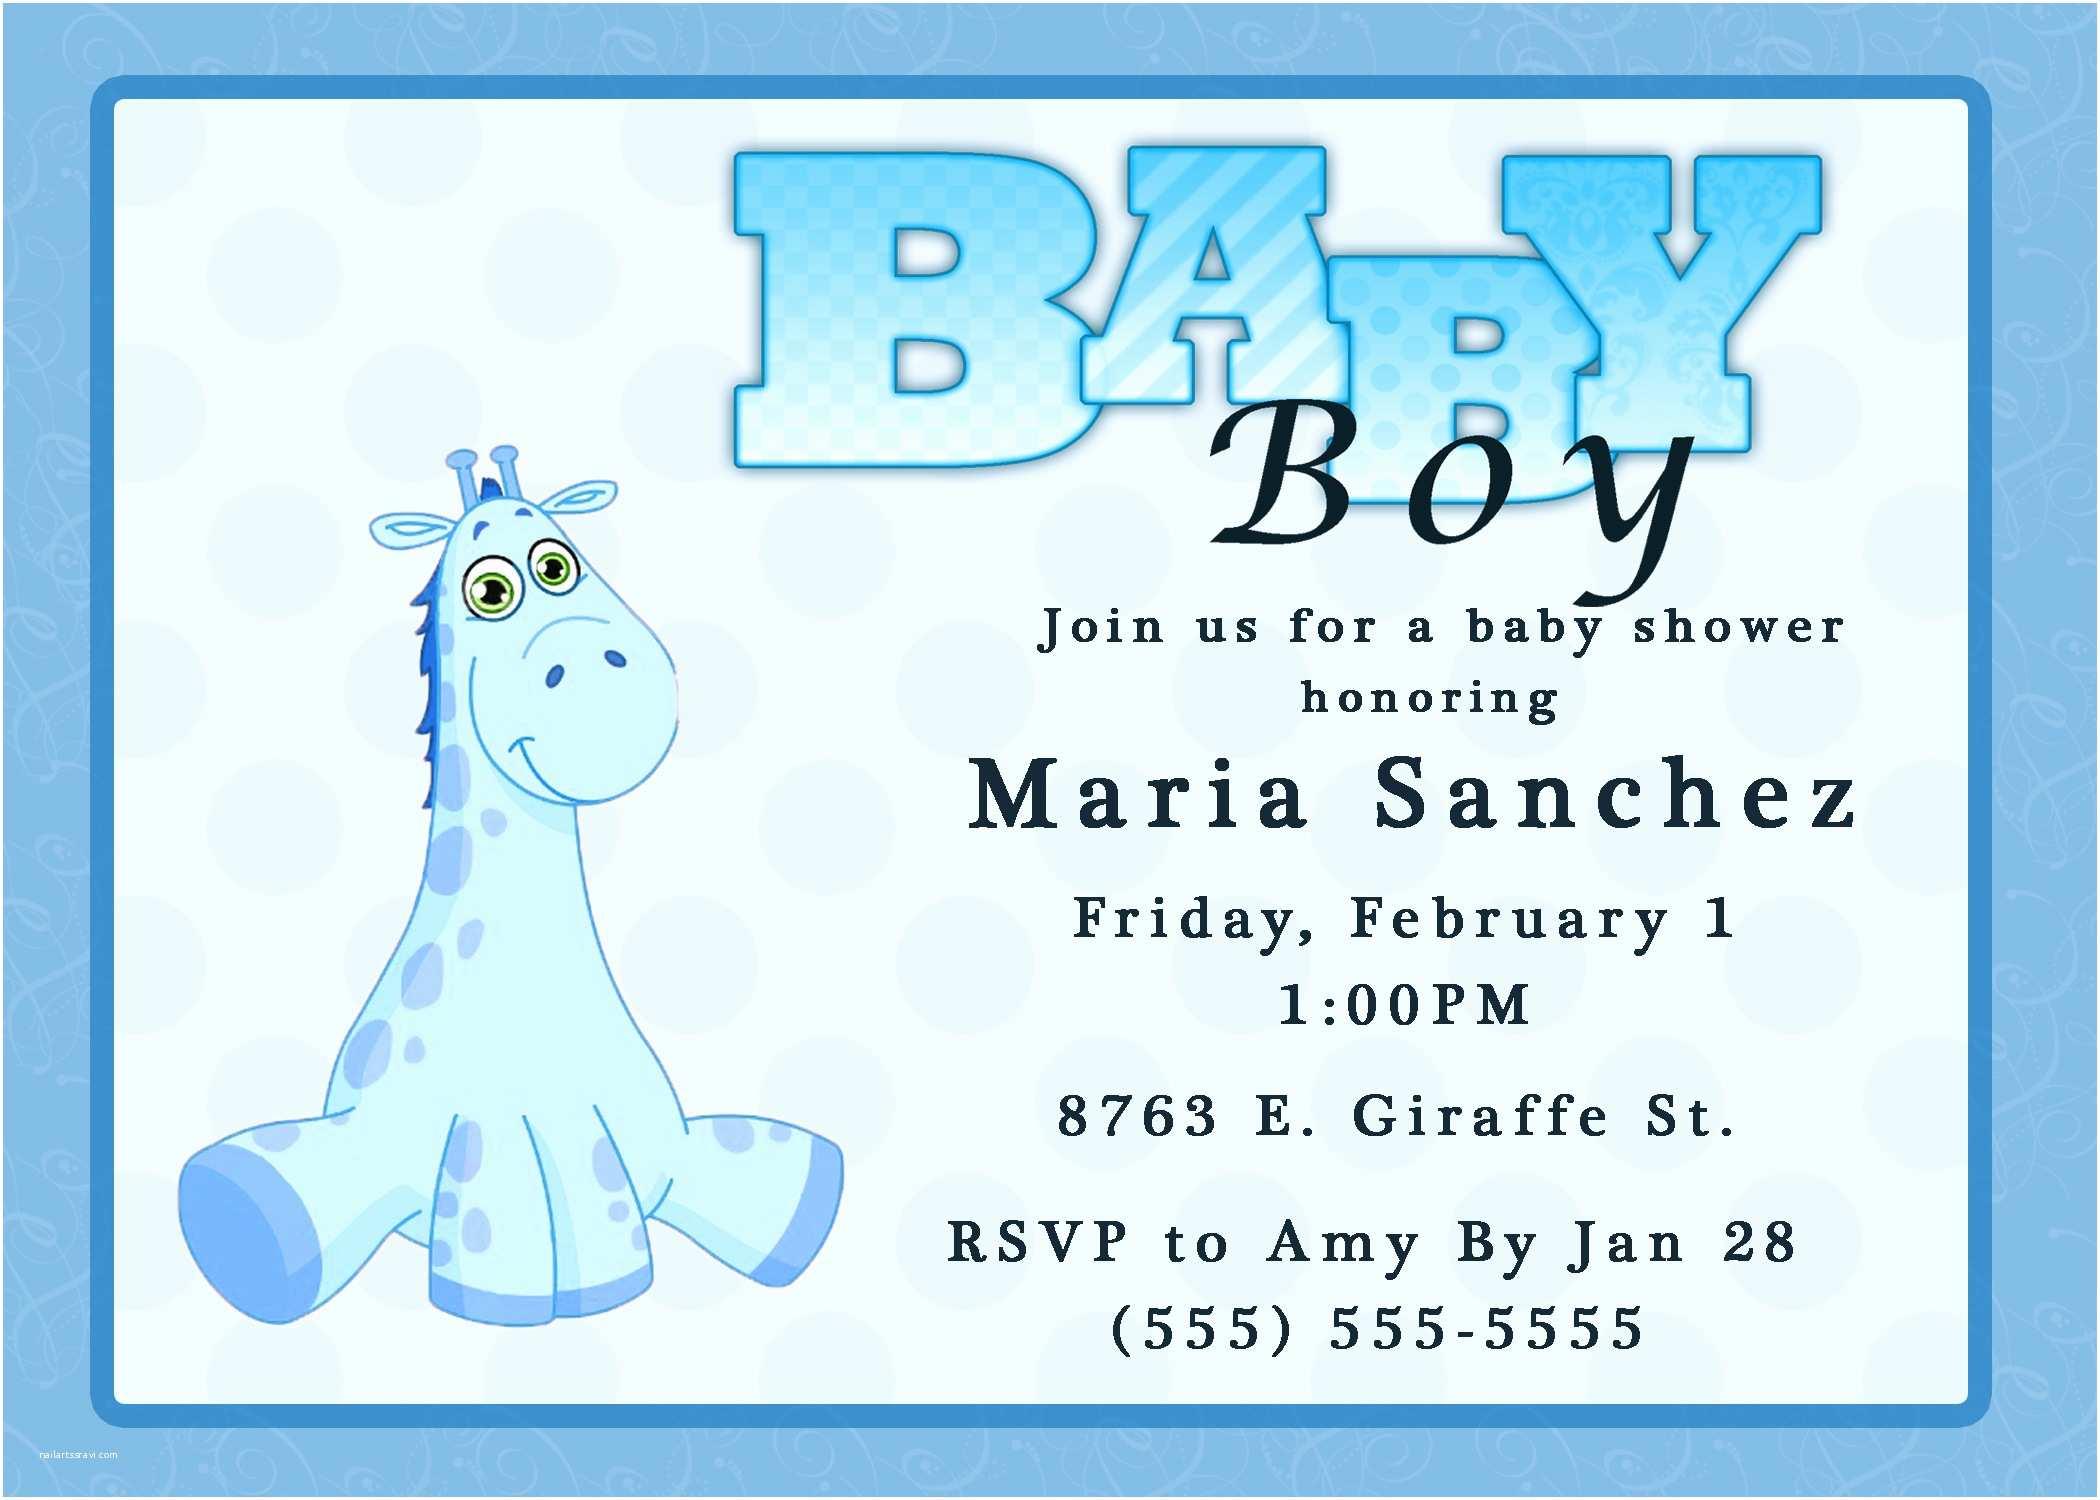 Baby Shower Invitation Wording Ideas Baby Boy Shower Invitation Wording Ideas